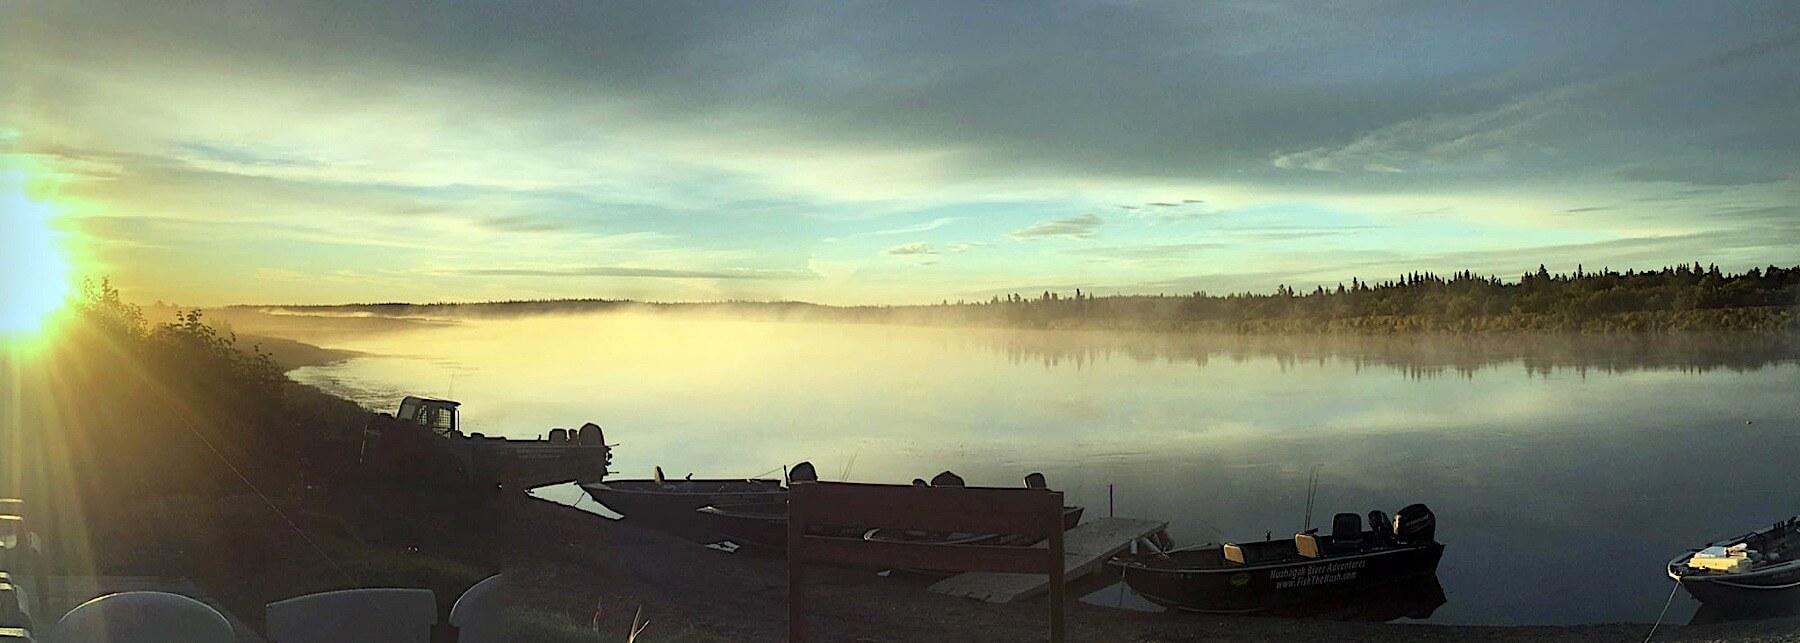 Bristol Bay fishing lodge boats and equipment in Alaska